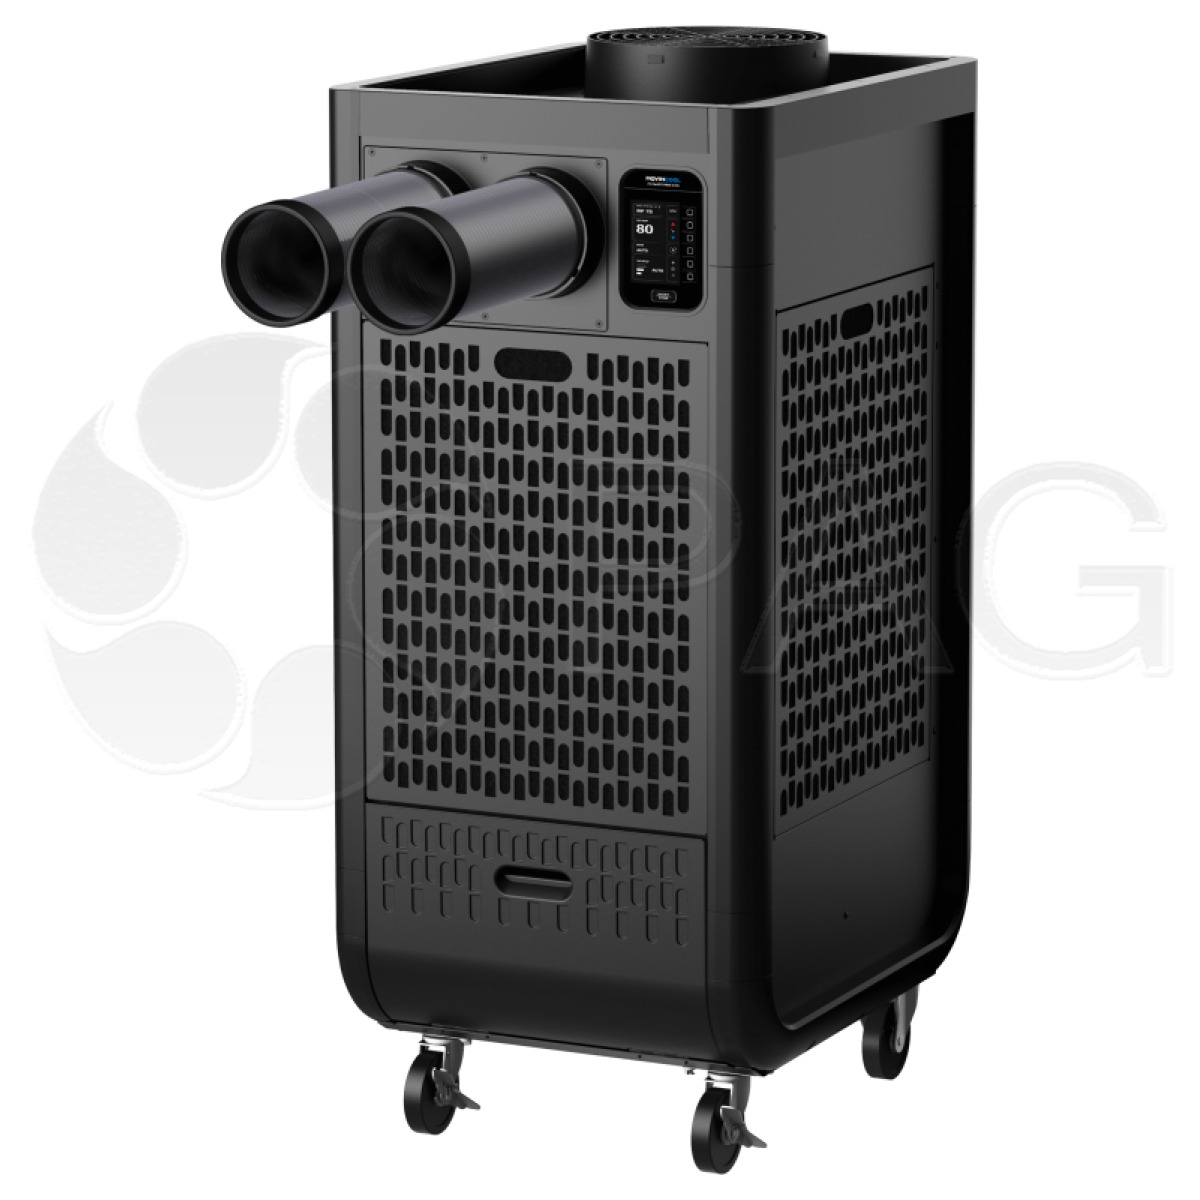 MovinCool-Climate-Pro-X14 portable air conditioner spot cooler